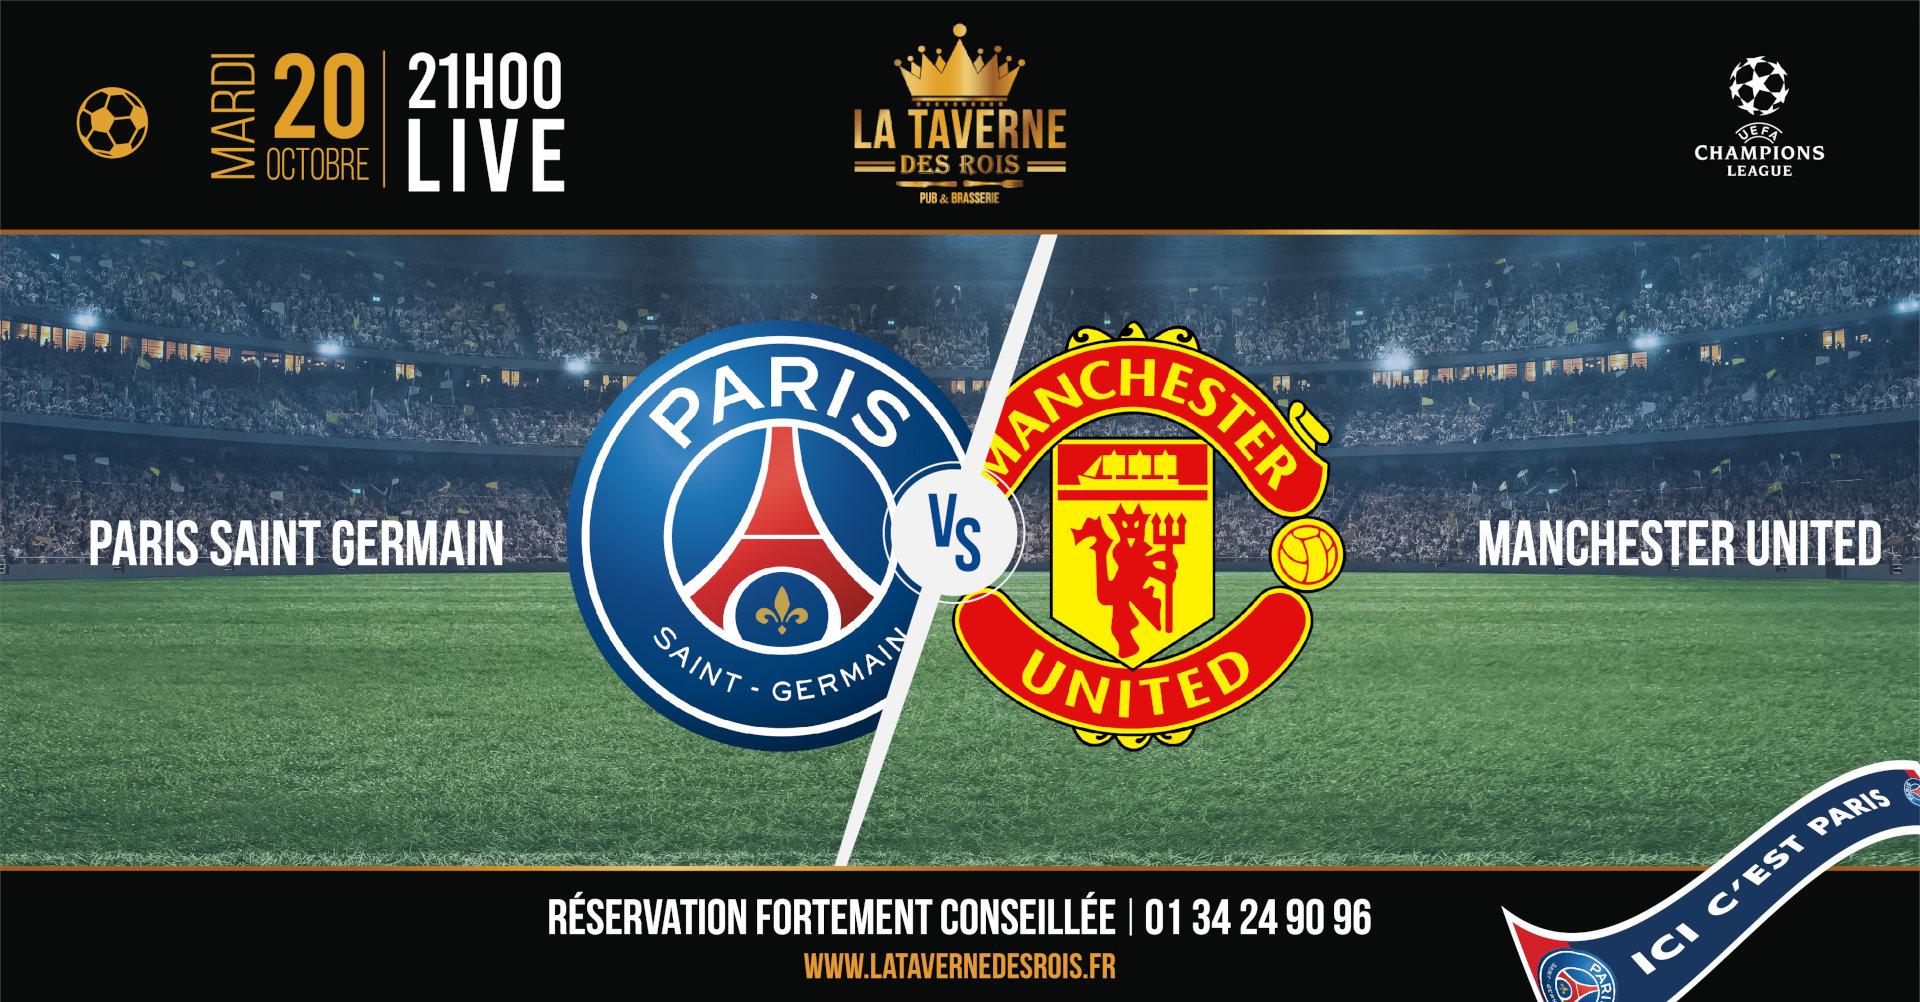 La Taverne des Rois, Cergy, PSG vs Manchester United, 20 octobre 2020